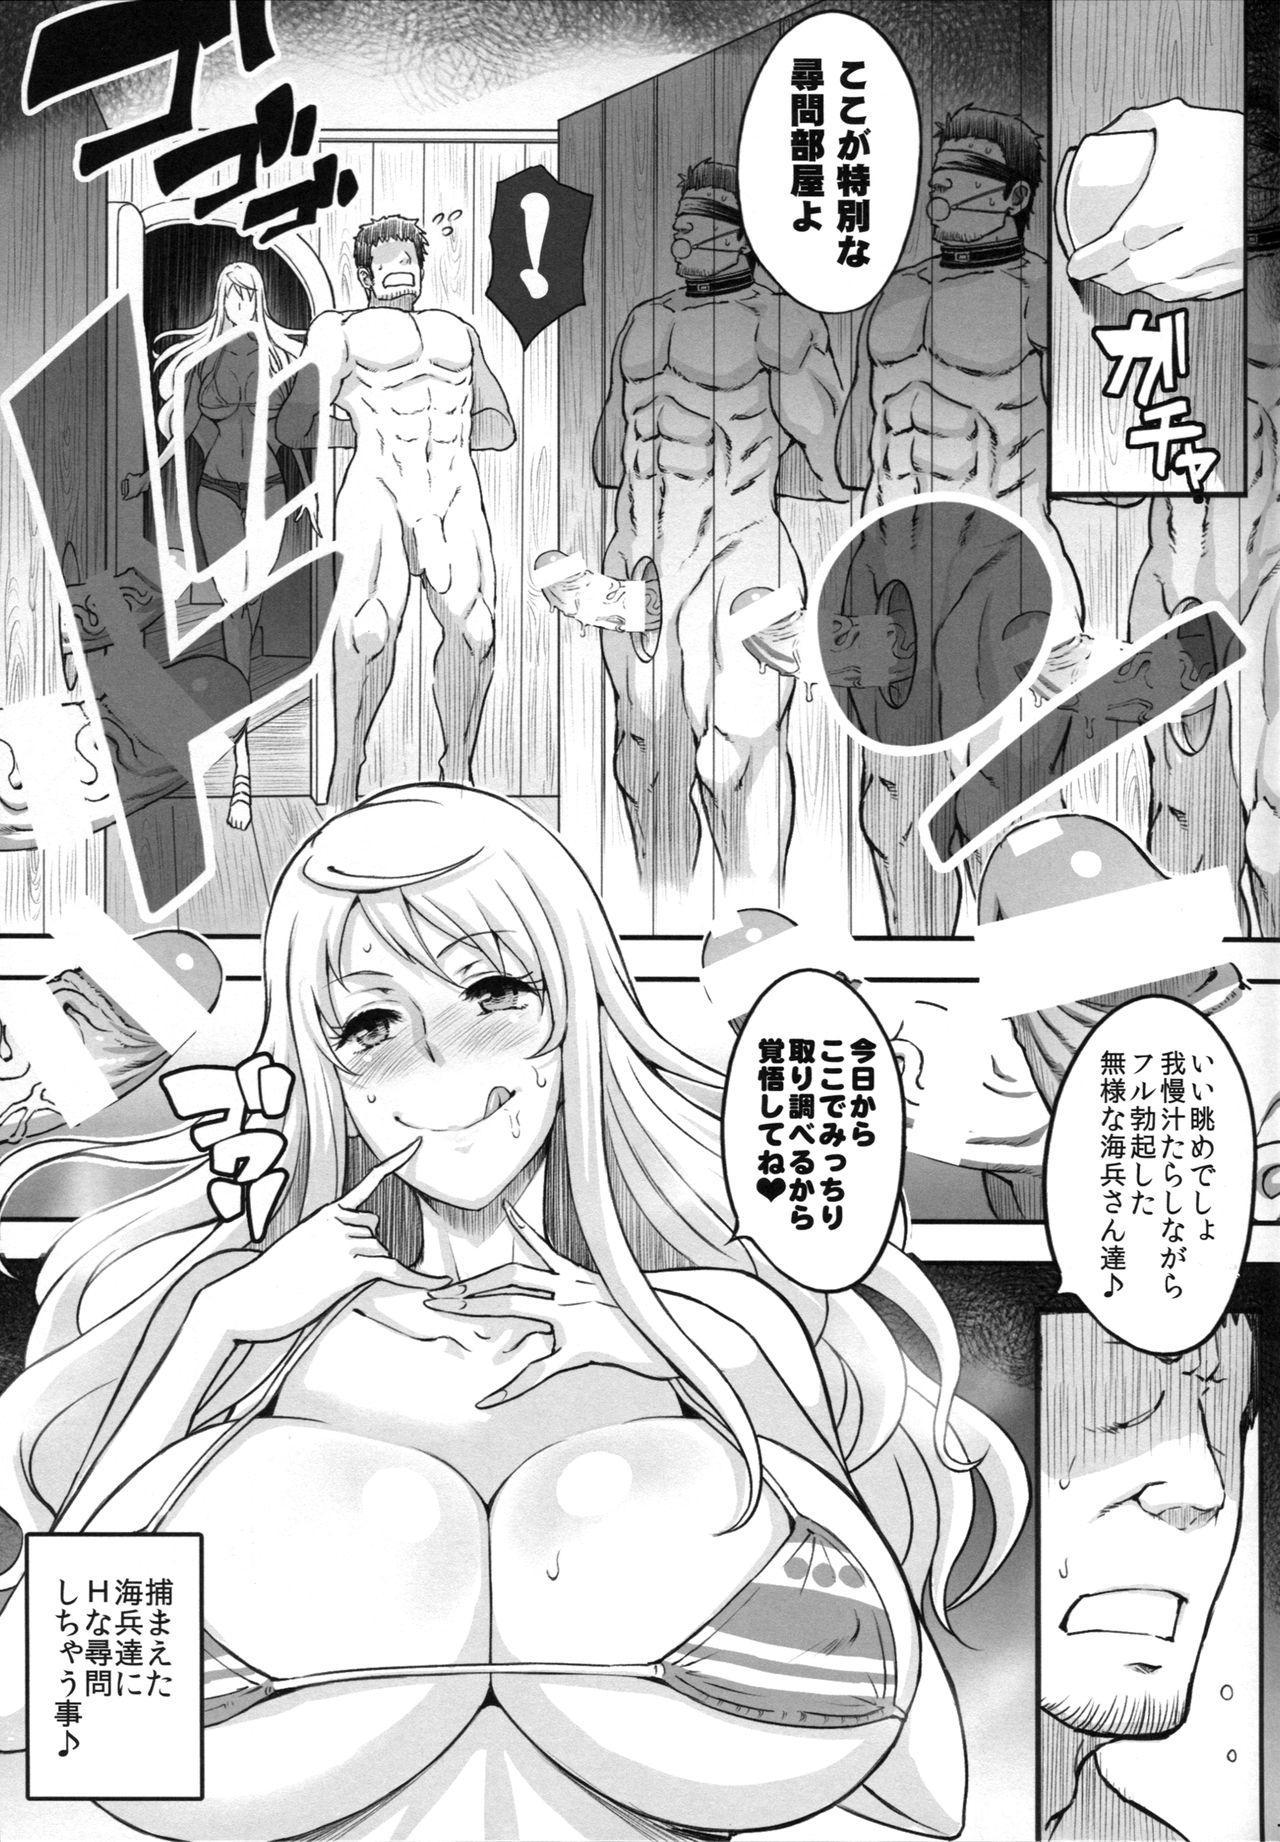 Rakuen Onna Kaizoku 5 - Women Pirate in Paradise 5